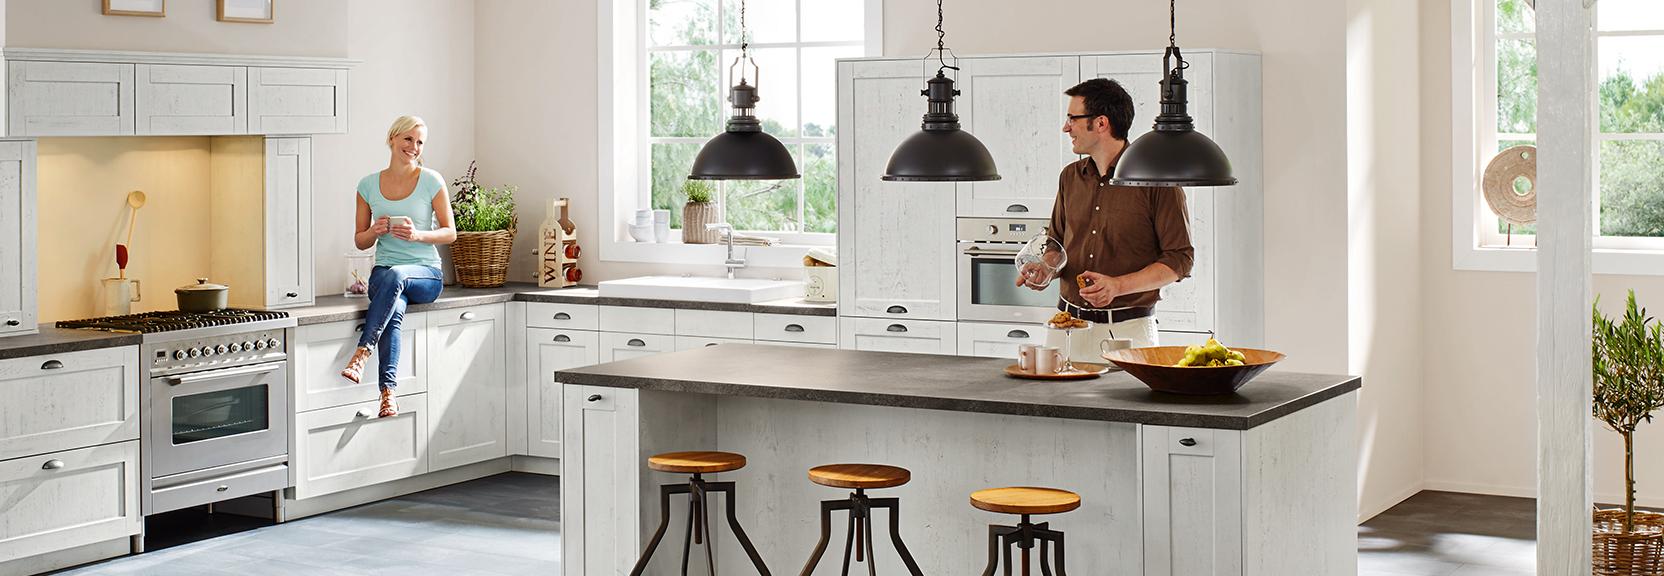 Full Size of Raffrollo Landhaus Küche Landhaus Küche Gebraucht Landhaus Küche Deko Shabby Landhaus Küche Küche Landhaus Küche